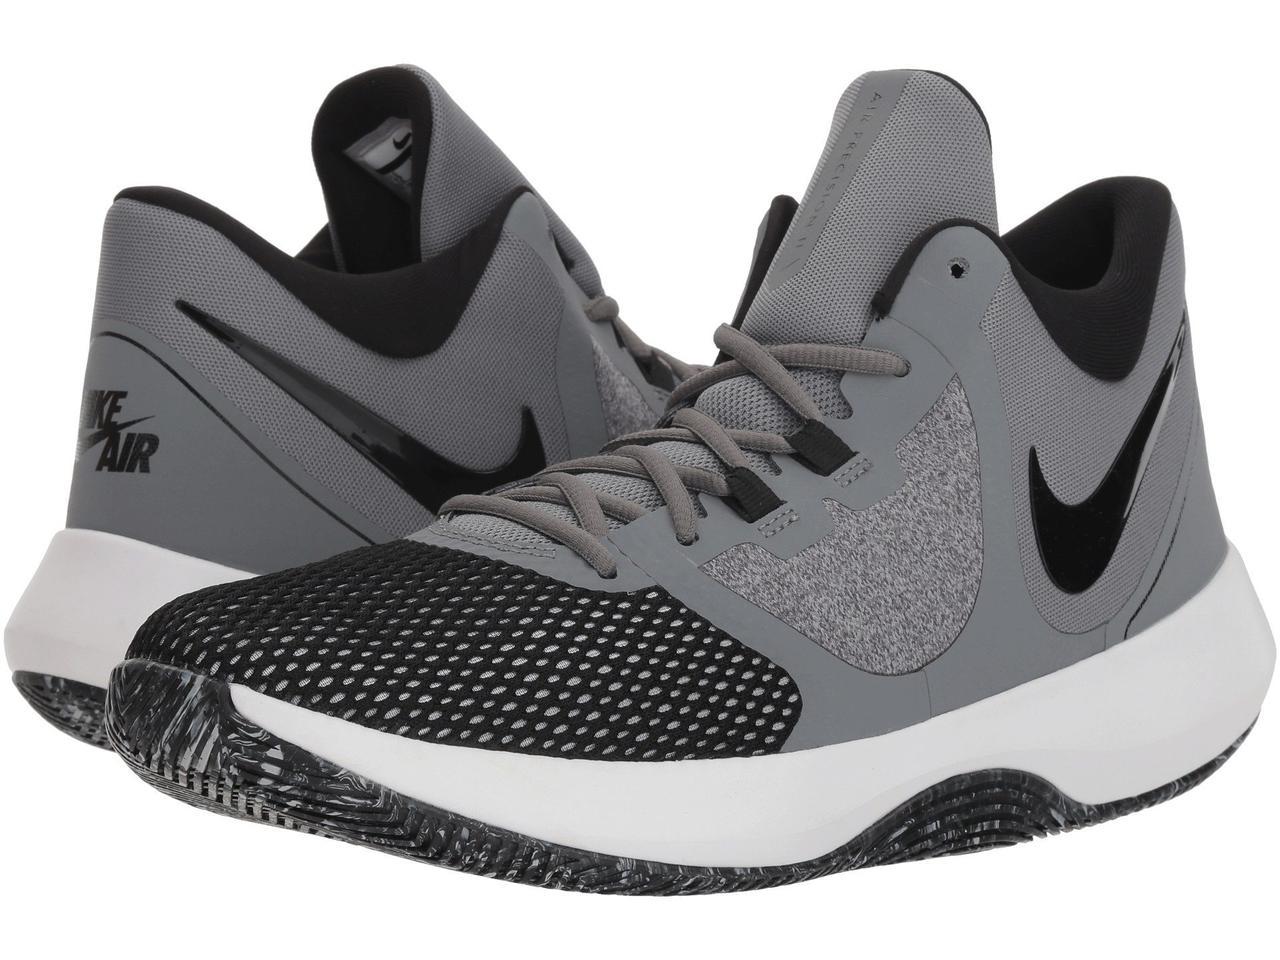 premium selection c6406 7cd46 Кроссовки Кеды (Оригинал) Nike Air Precision II Cool Grey Black White